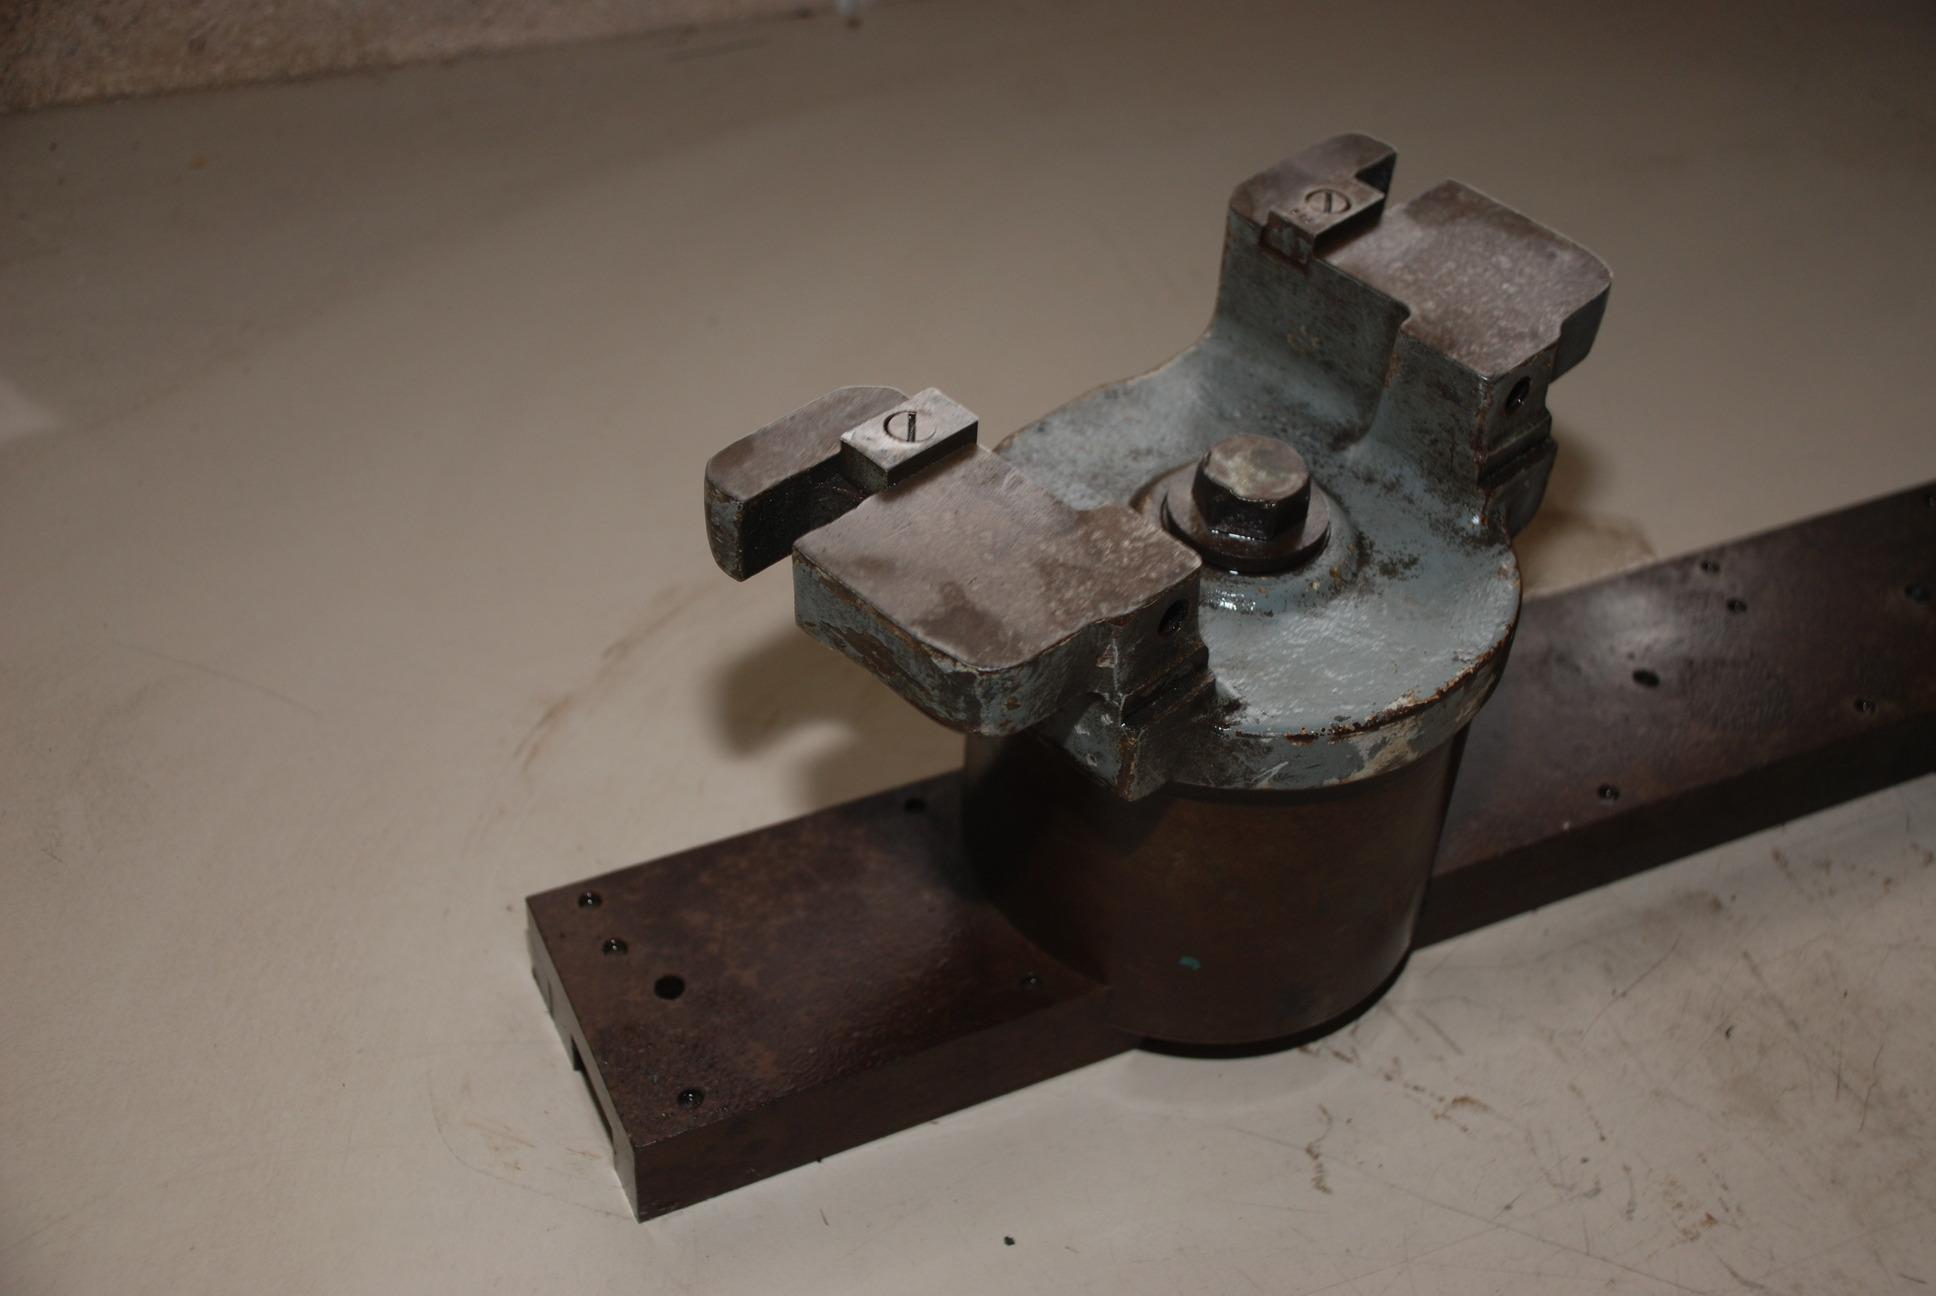 Tool And Cutter Grinder ~ Cincinnati no tool and cutter grinder attachment nopl